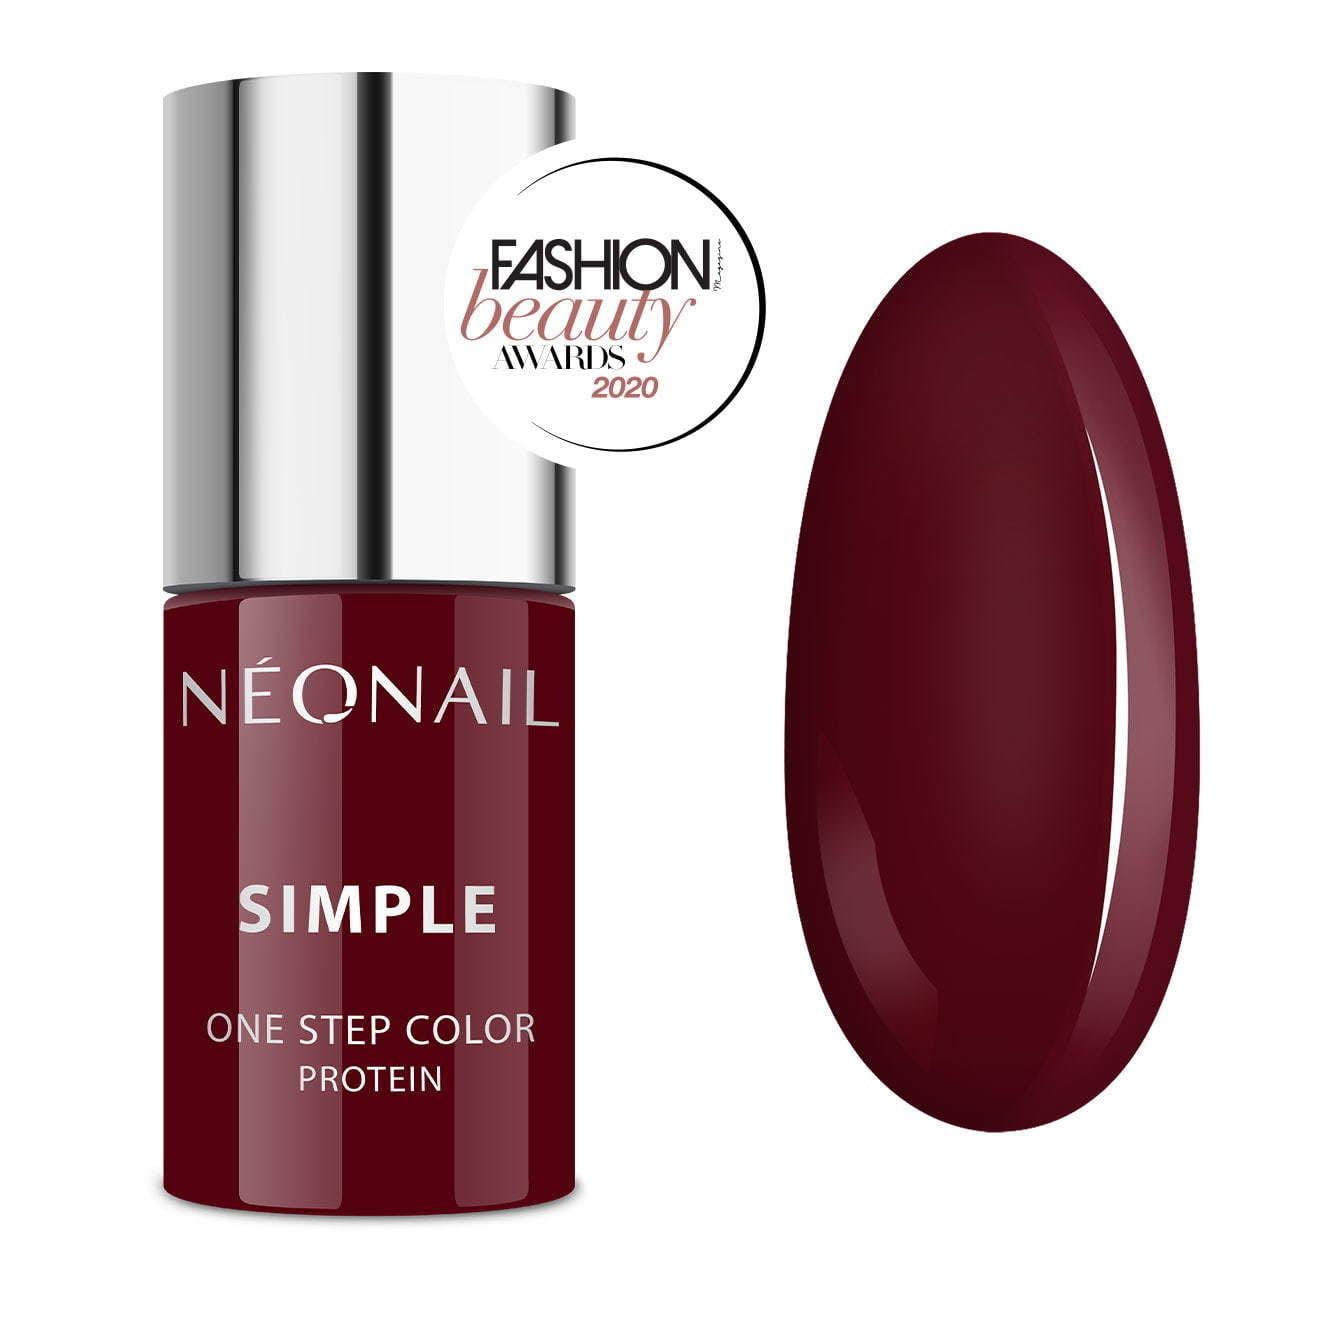 20% rabatu na lakiery hybrydowe @Neonail Simple 3w1